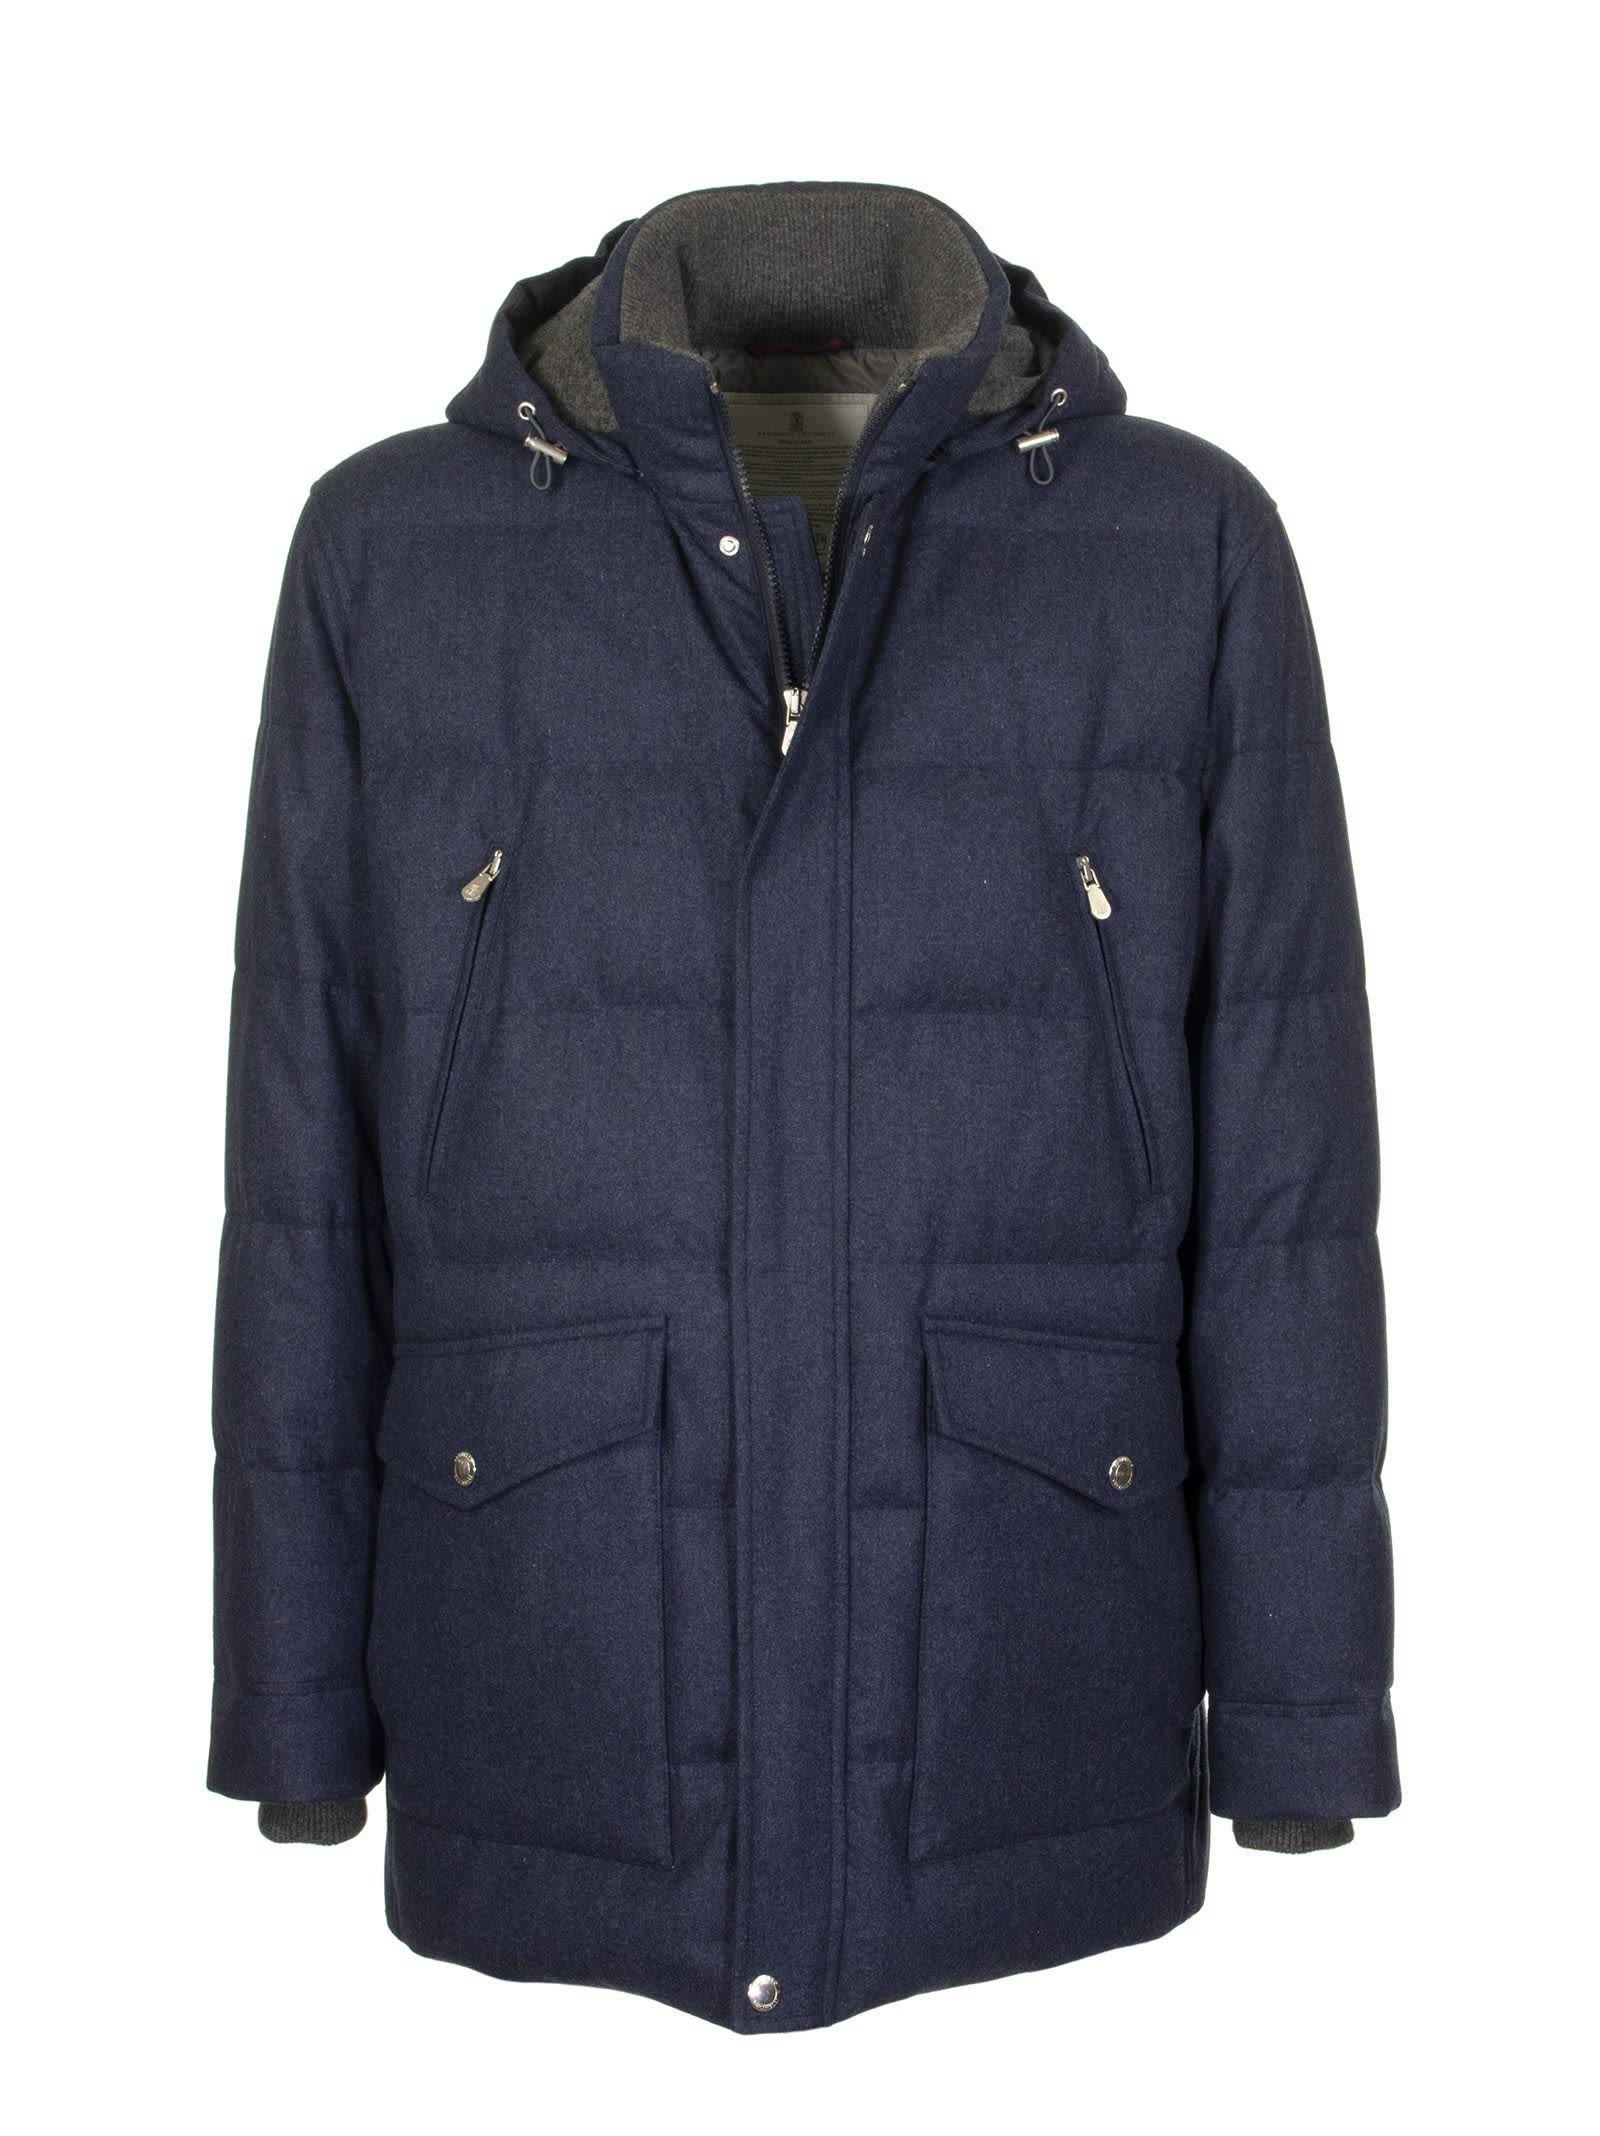 Brunello Cucinelli Water-resistant Lightweight Wool, Silk And Cashmere Flannel Down Jacket With Deta